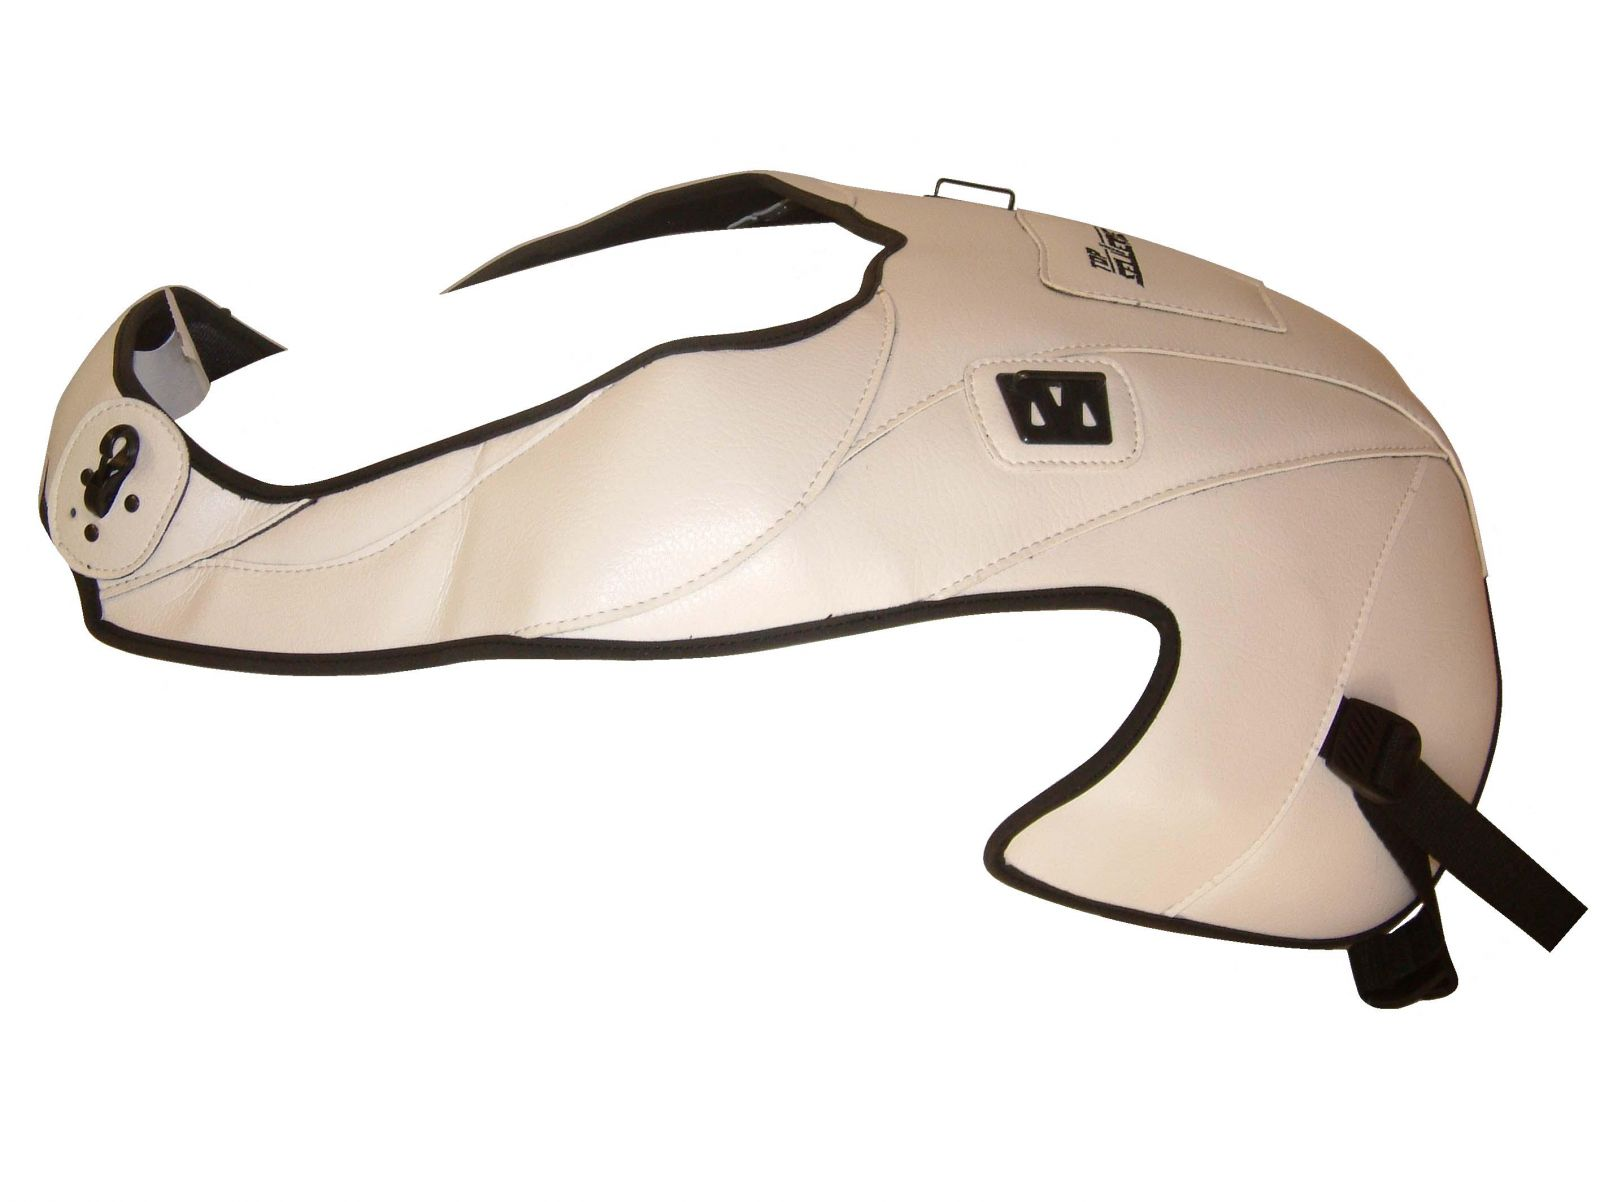 Capa de depósito TPR6020 - SUZUKI B-KING [≥ 2007]